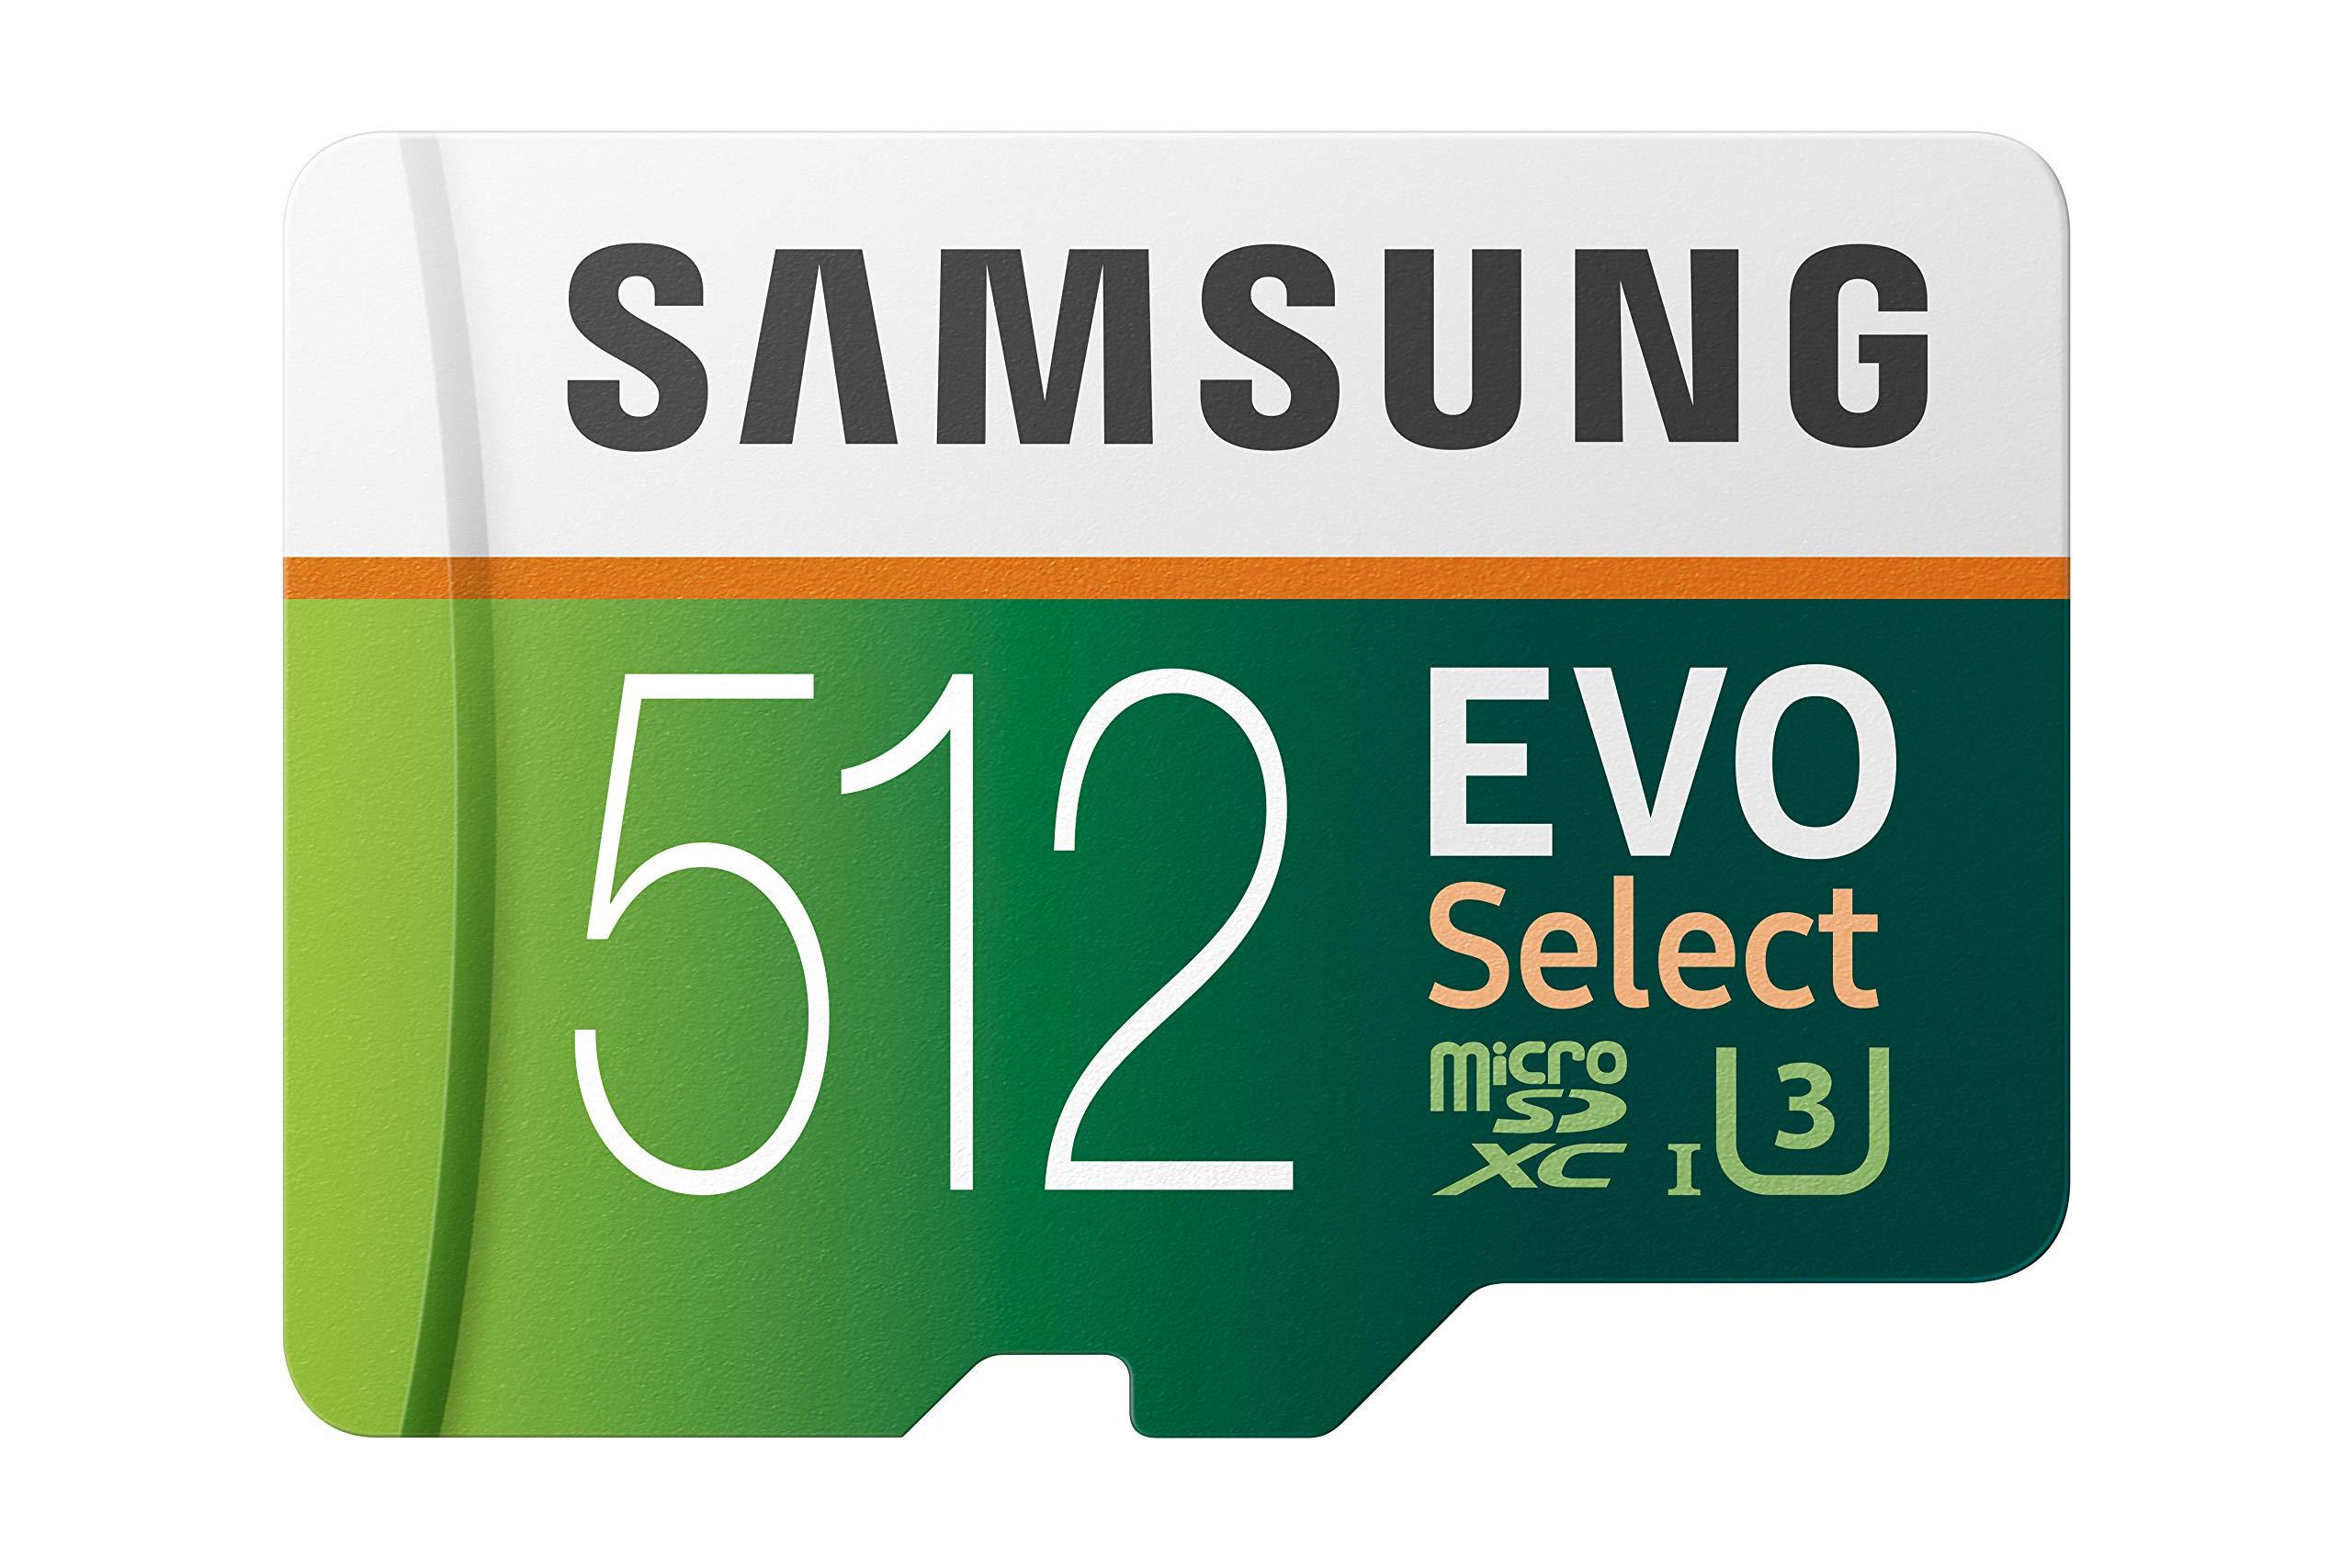 Samsung  (MB-ME512GA/AM) 512GB 100MB/s (U3) MicroSDXC Evo Select Memory Card with Adapter